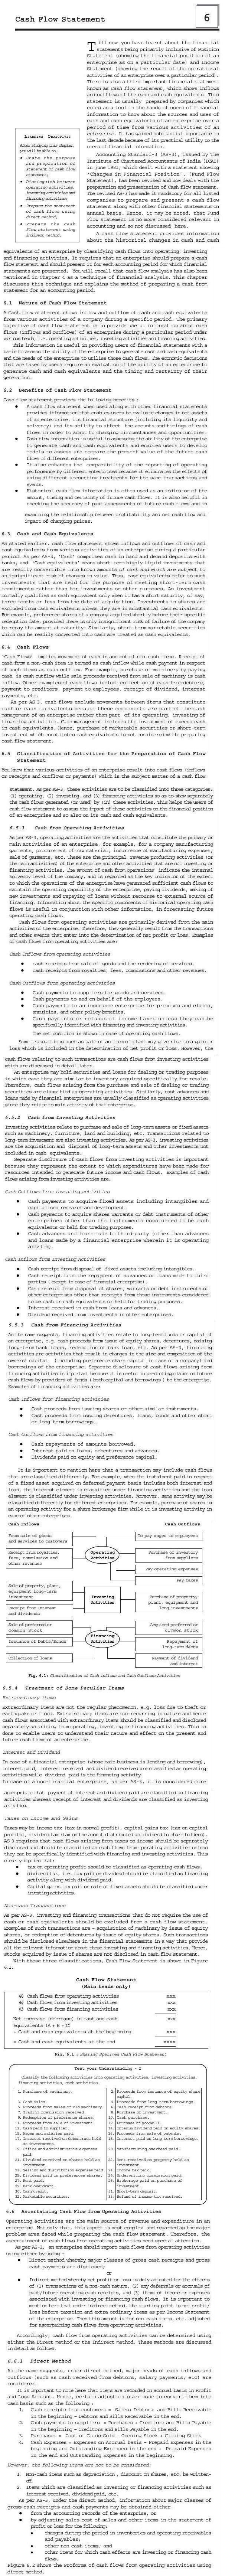 NCERT Class XII Accountancy II Chapter 6 - Cash Flow Statement